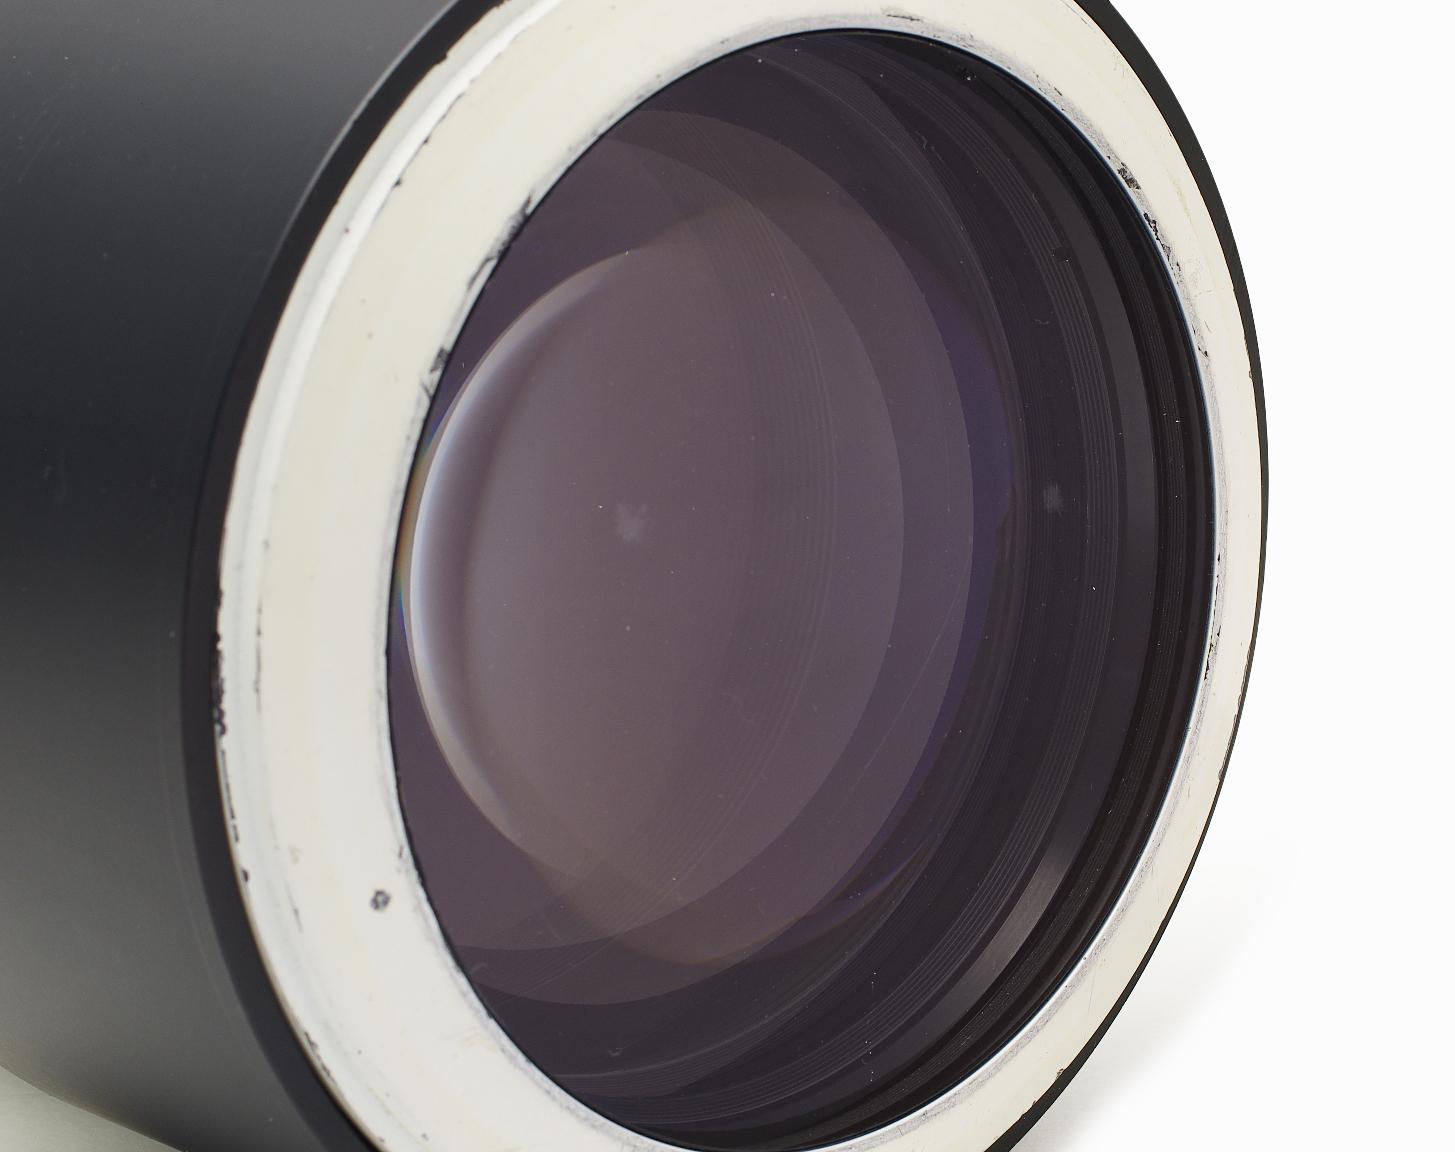 P-Angenieux-1-5-210-mm-Professional-re-mounted-to-Fujifilm-GFX Indexbild 4